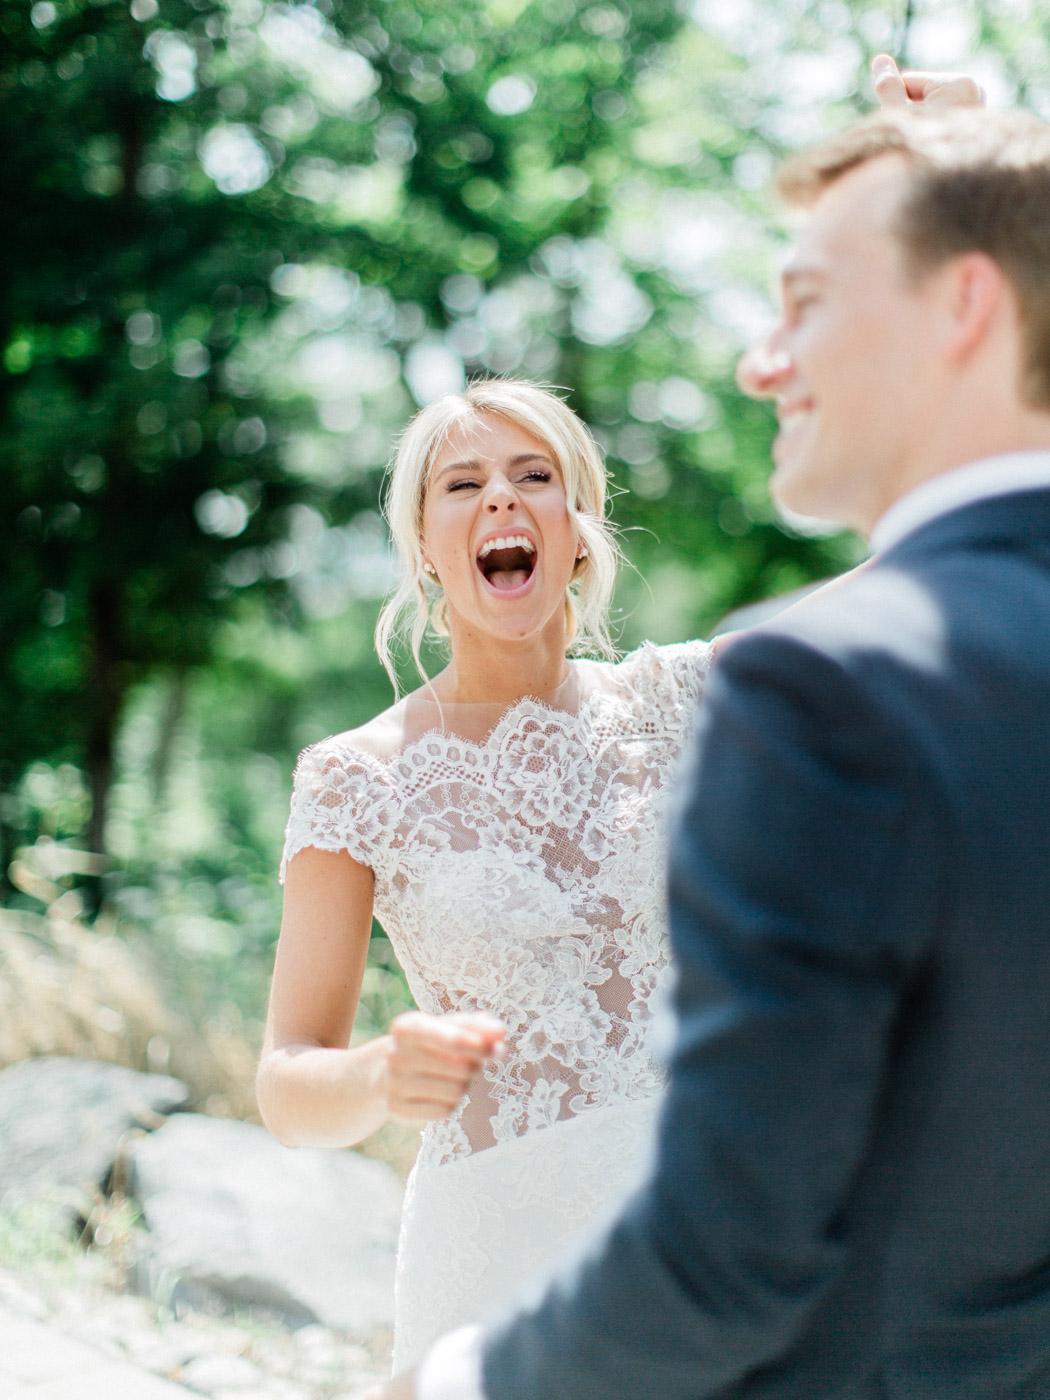 Toronto-Muskoka-wedding-photographer-summery-fun-documentary-the-marriott-rosseau36.jpg